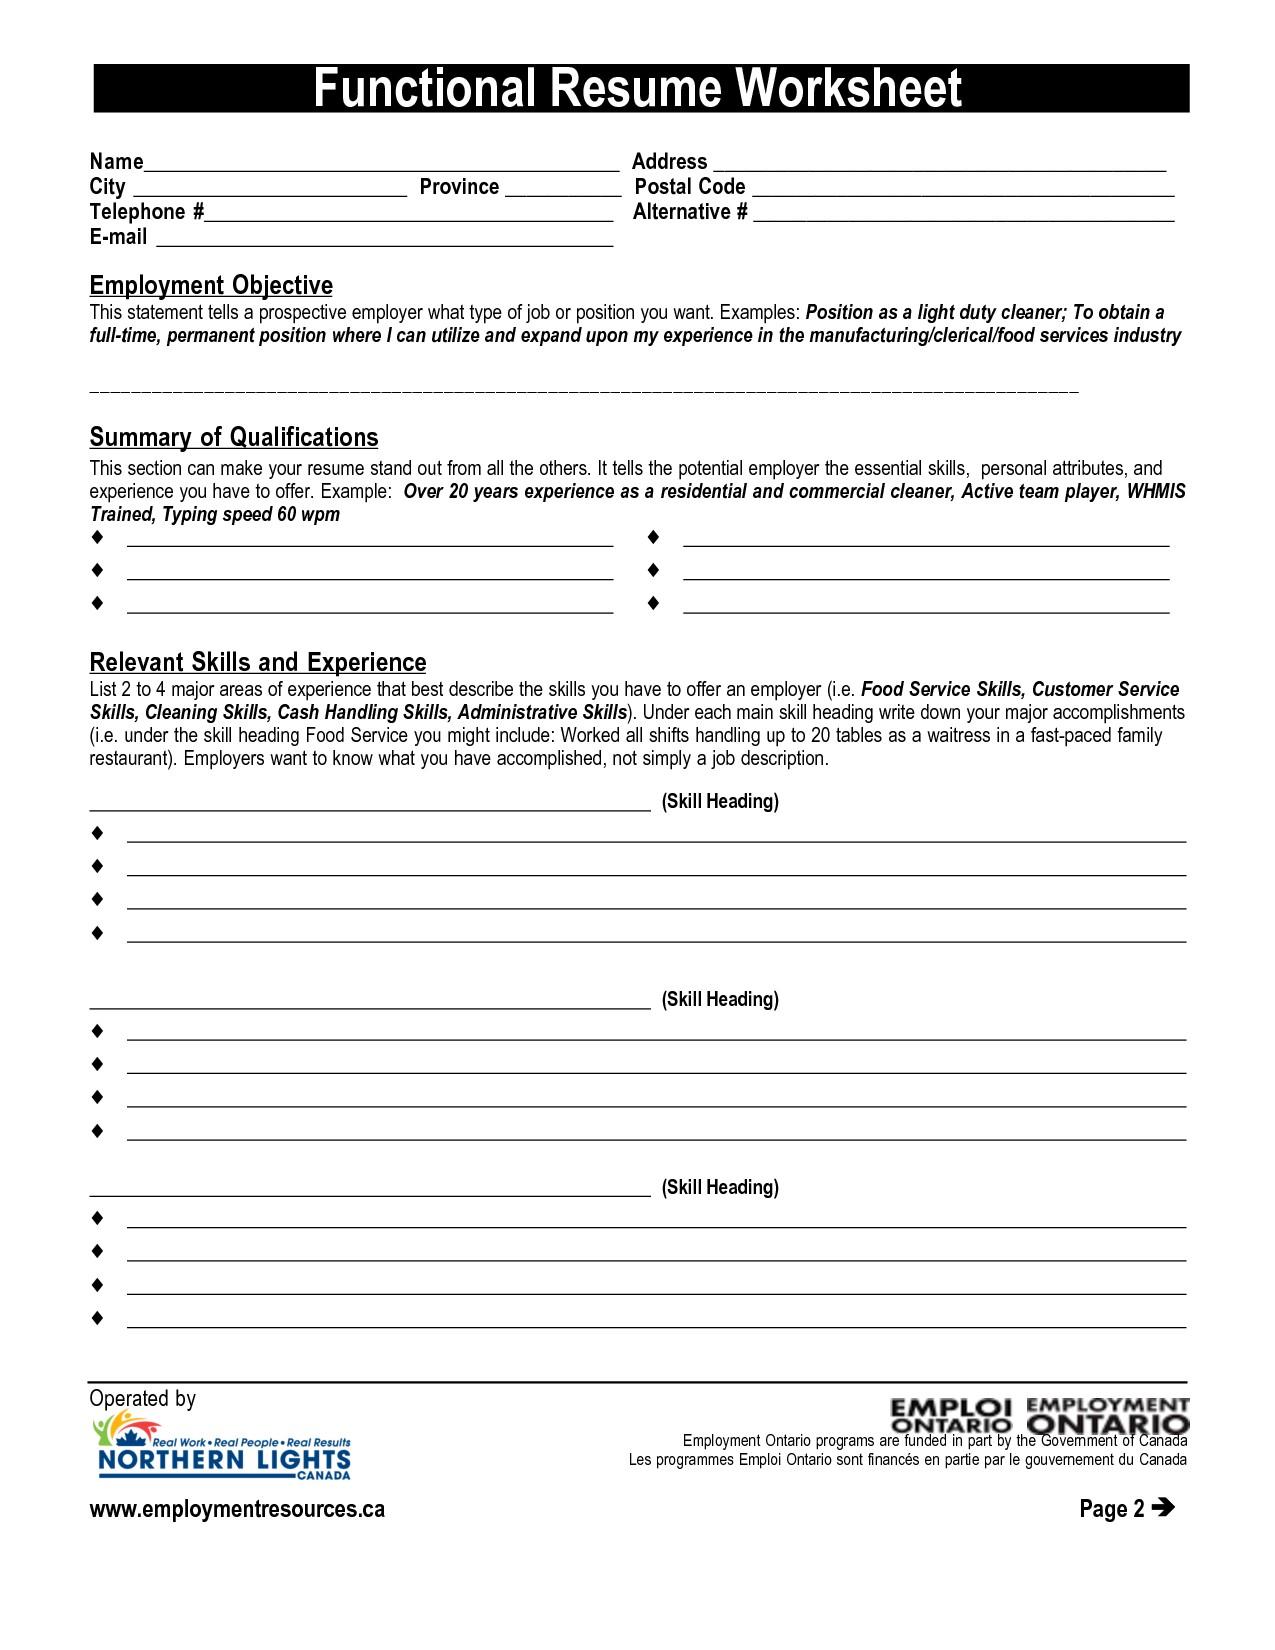 Resume Worksheets For Students